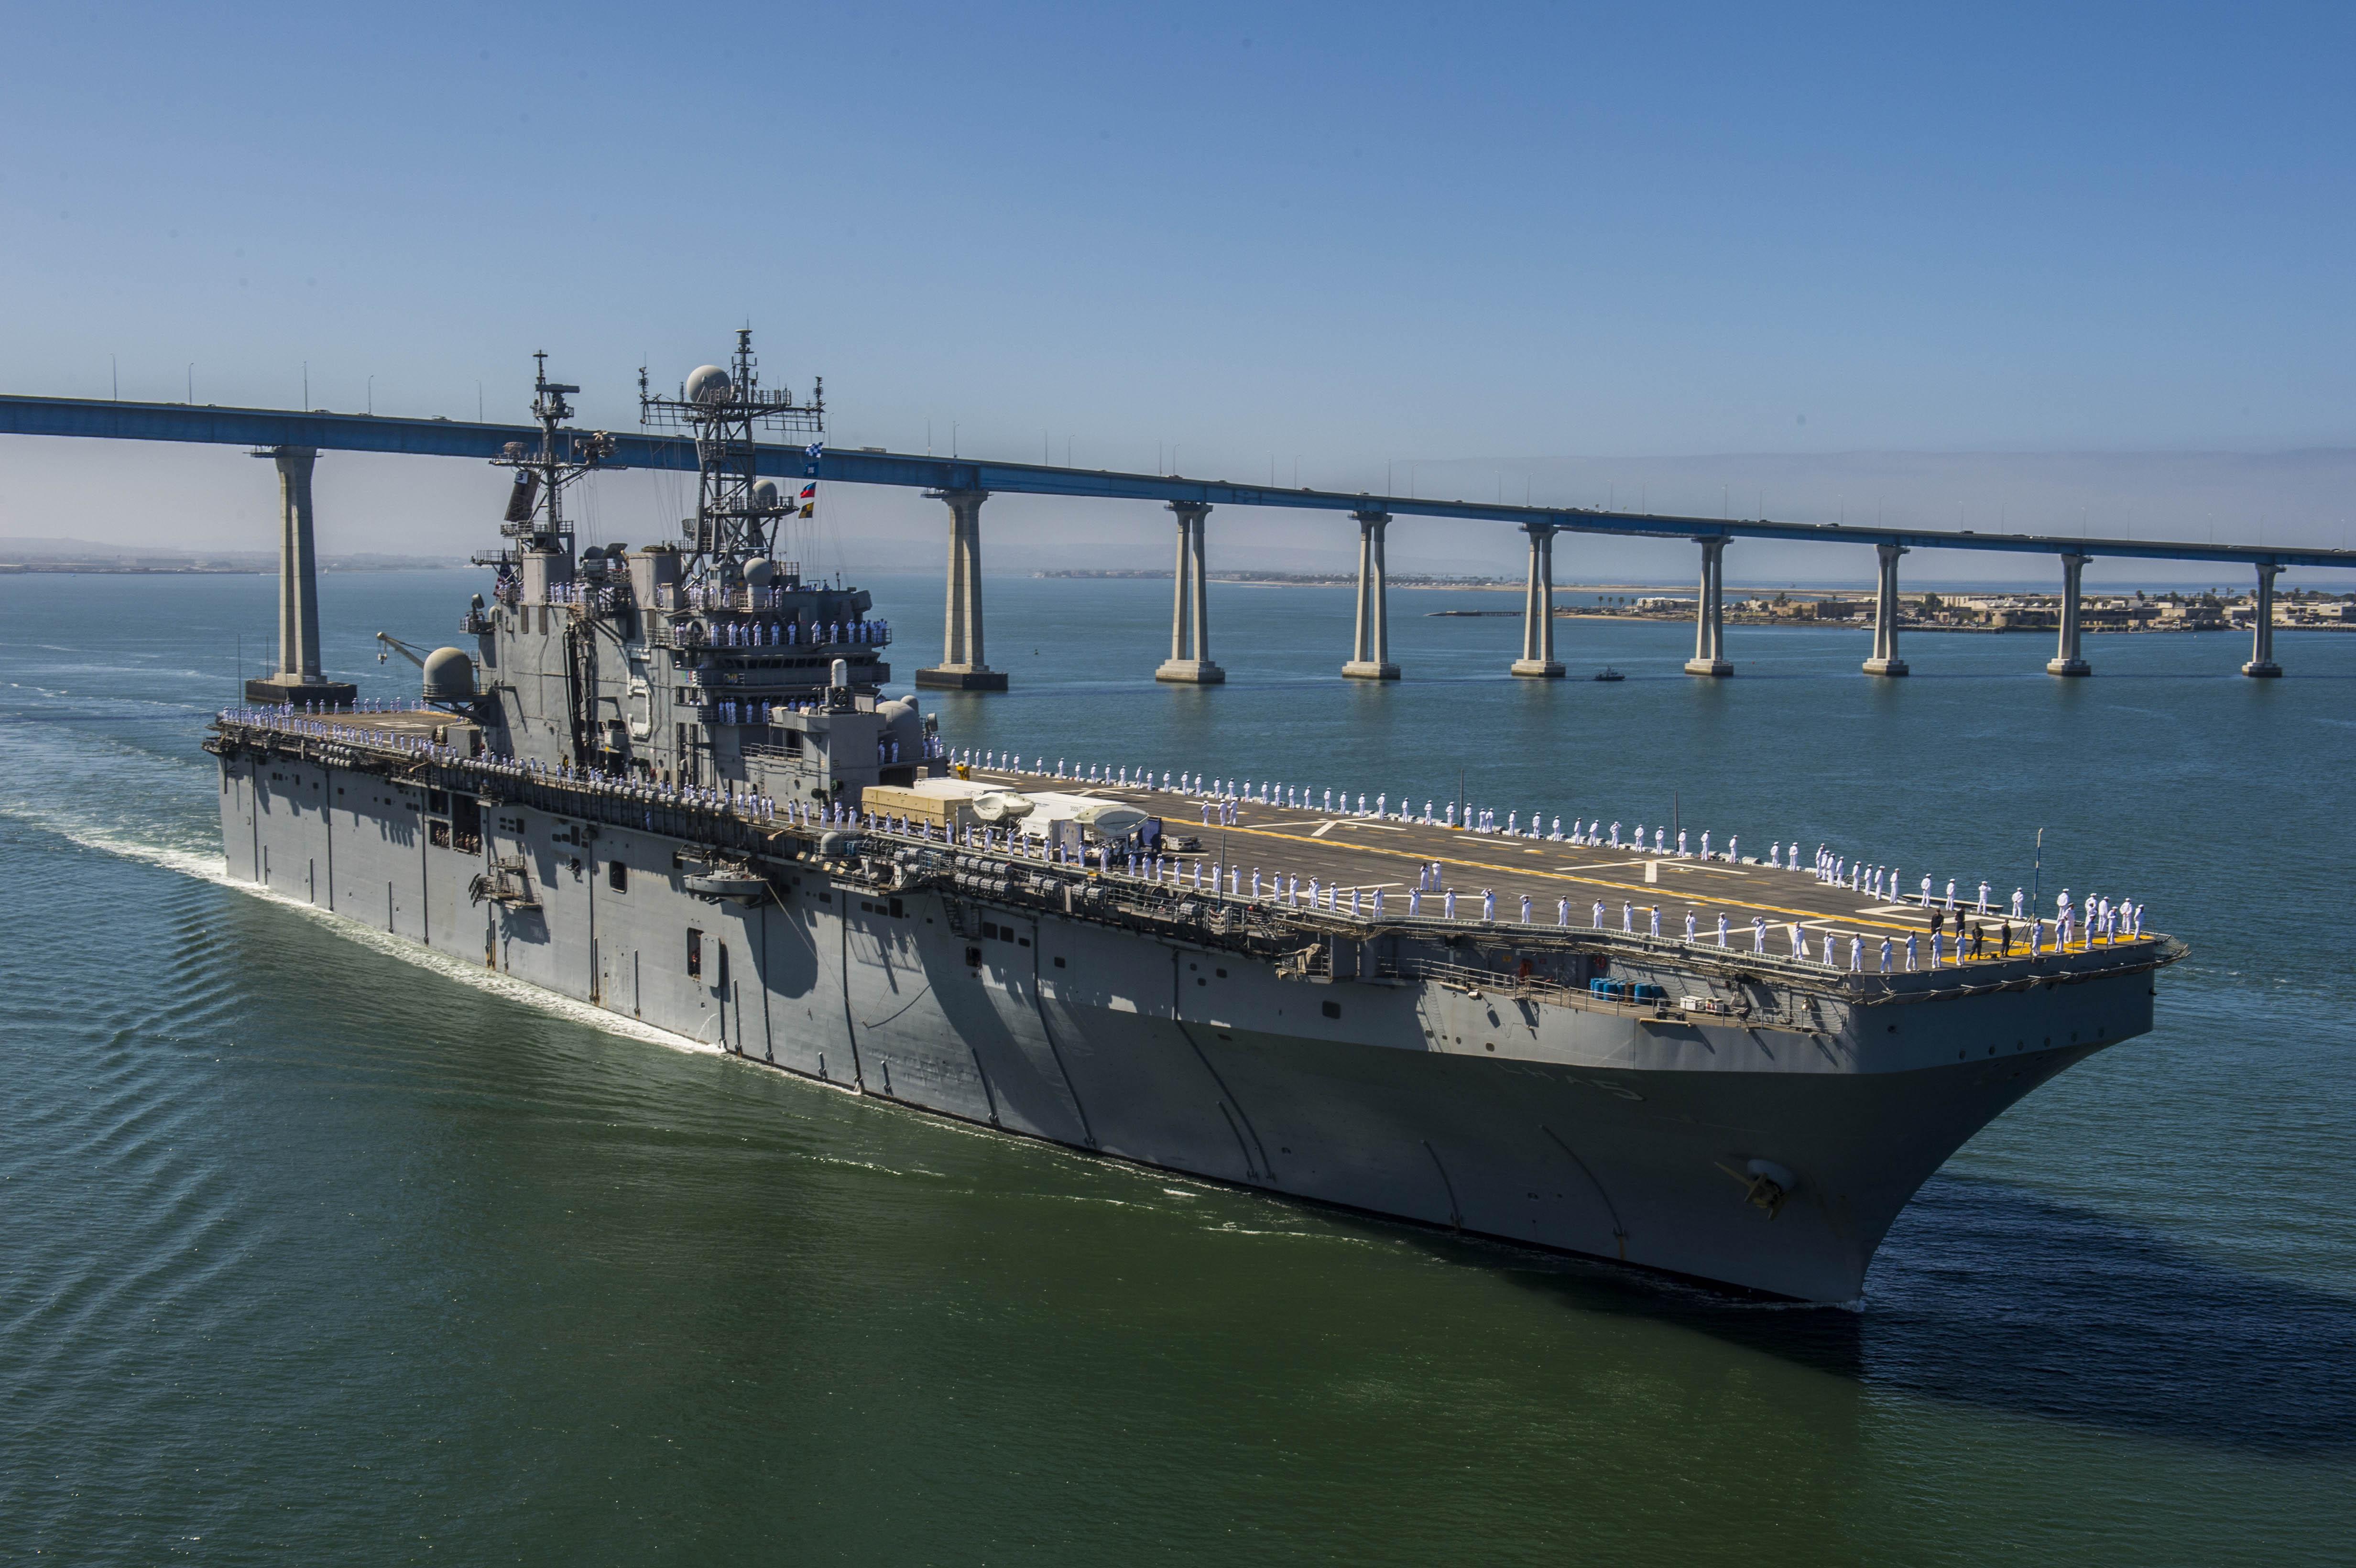 USS PELELIU LHA-5 Auslaufen San Diego am 17.06.2014 Bild: U.S. Navy